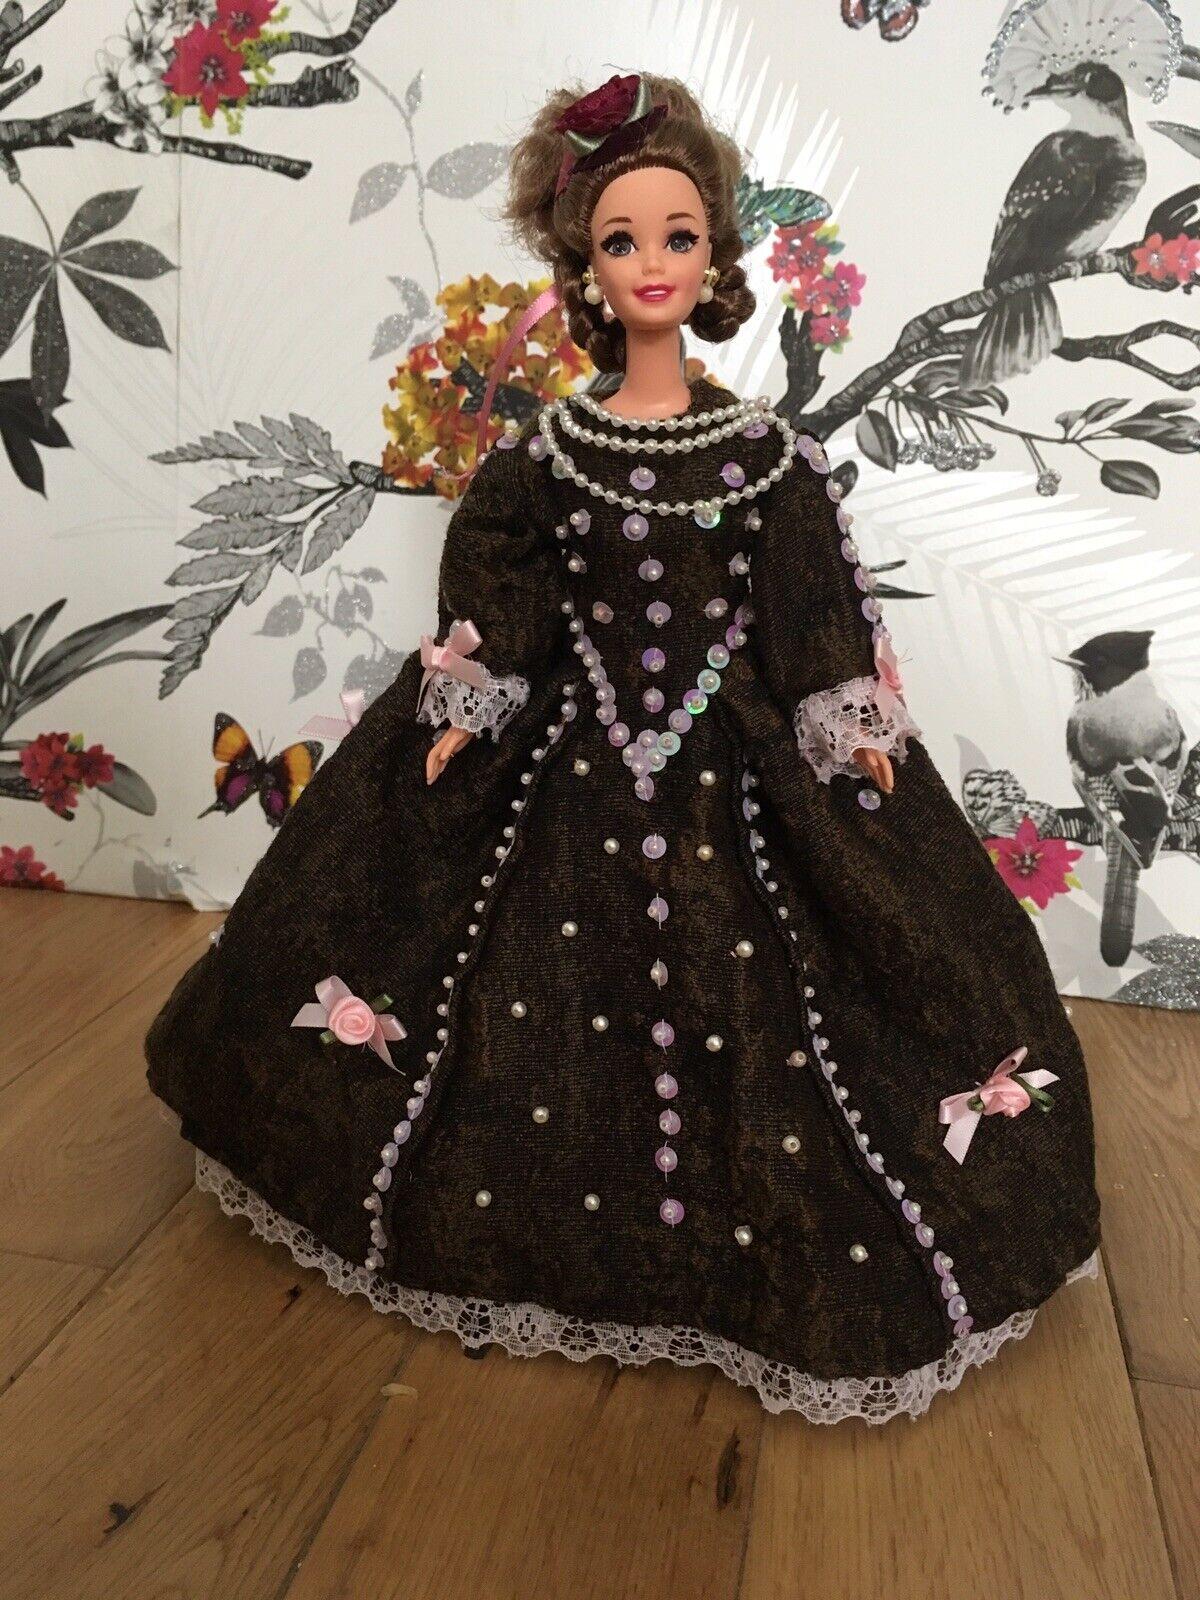 OOAK Handmade Doll Barbie Dress Medieval Elizabeth I Queen Tudor Tudor Tudor Collector Item 377193